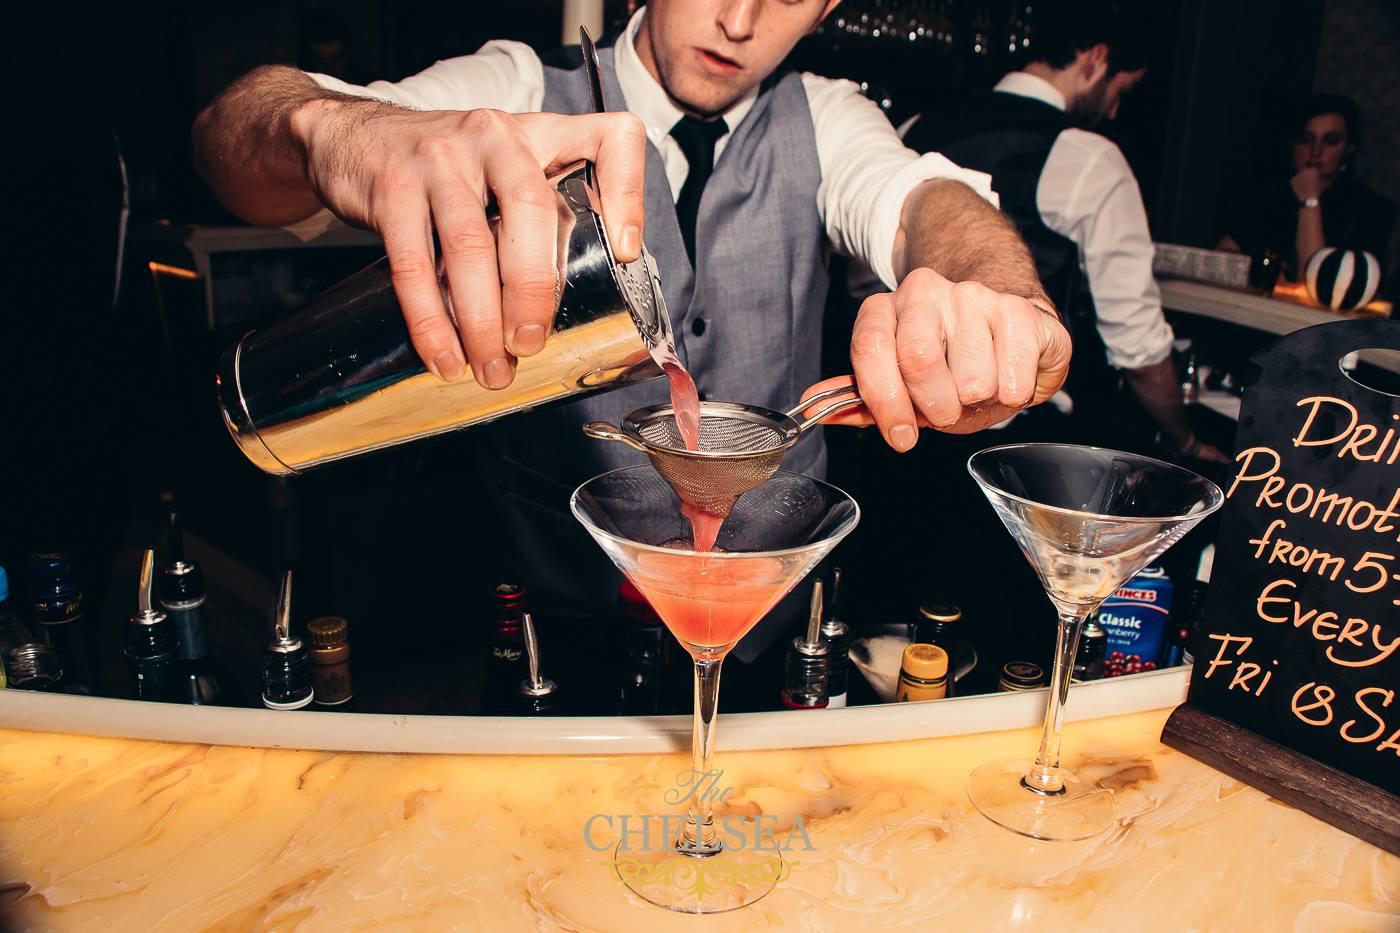 Cocktail-making-1